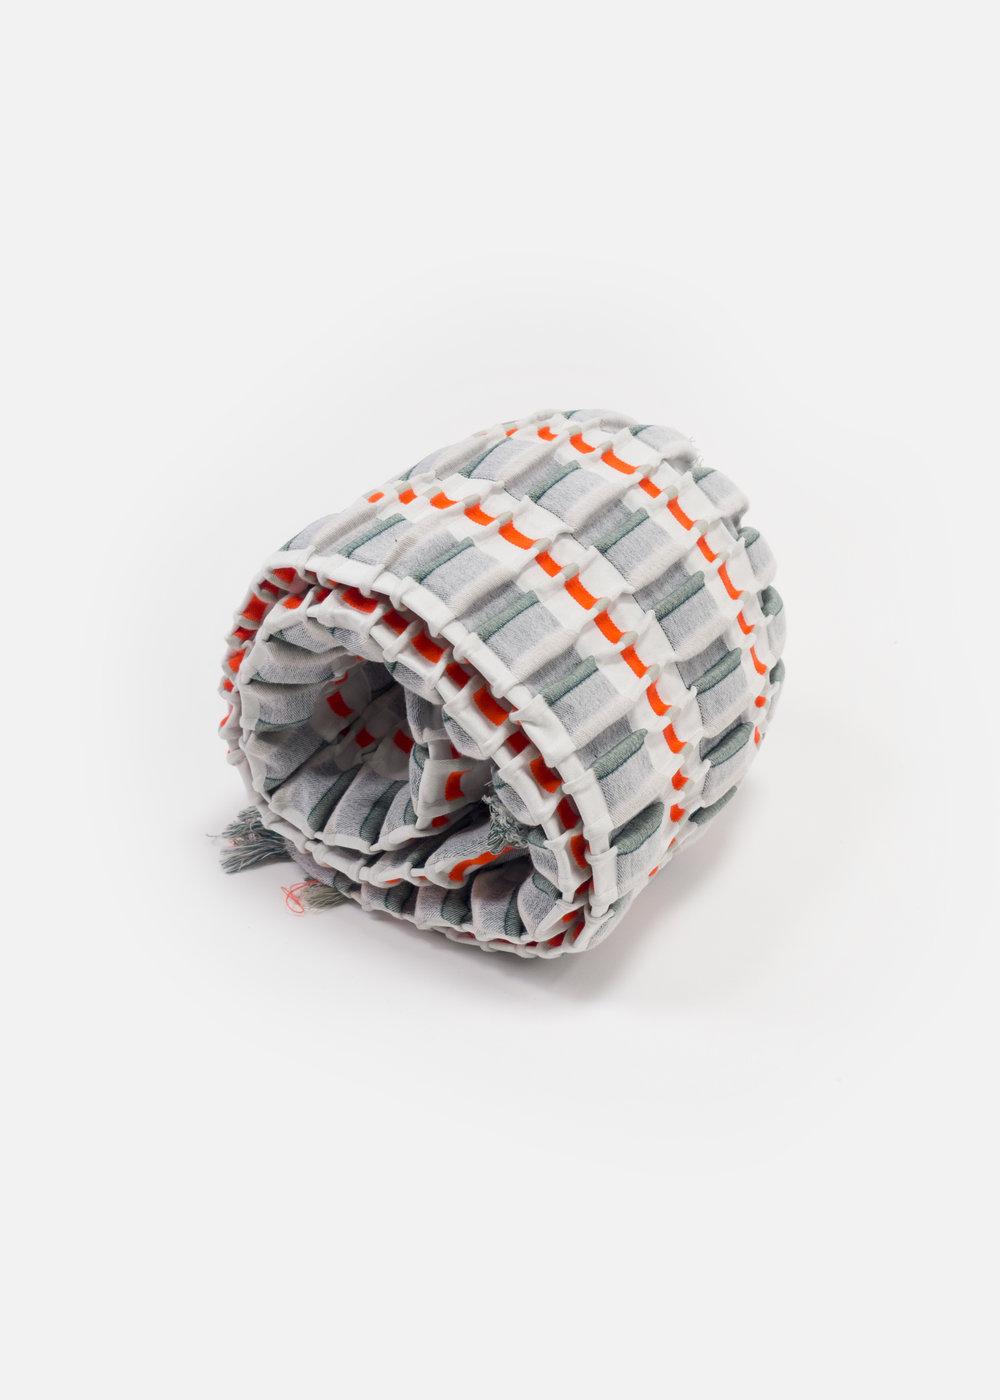 robin pleun maas woven textile envisions